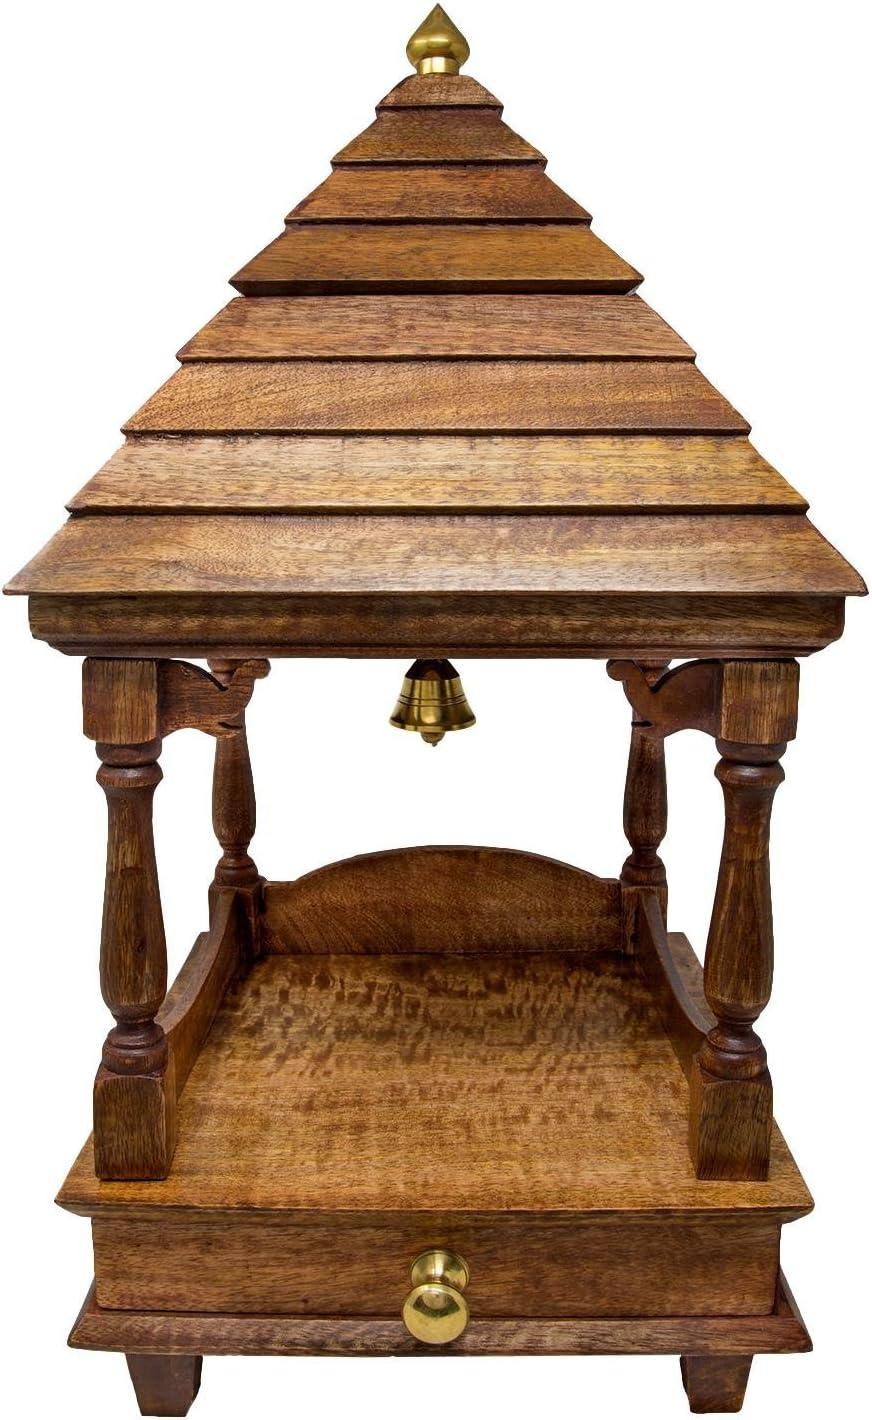 Amazon Com Shalinindia Pooja Mandap Temple For Home Wooden Temple Home Temple Pooja Mandir 20x10x10 Diy Home Kitchen